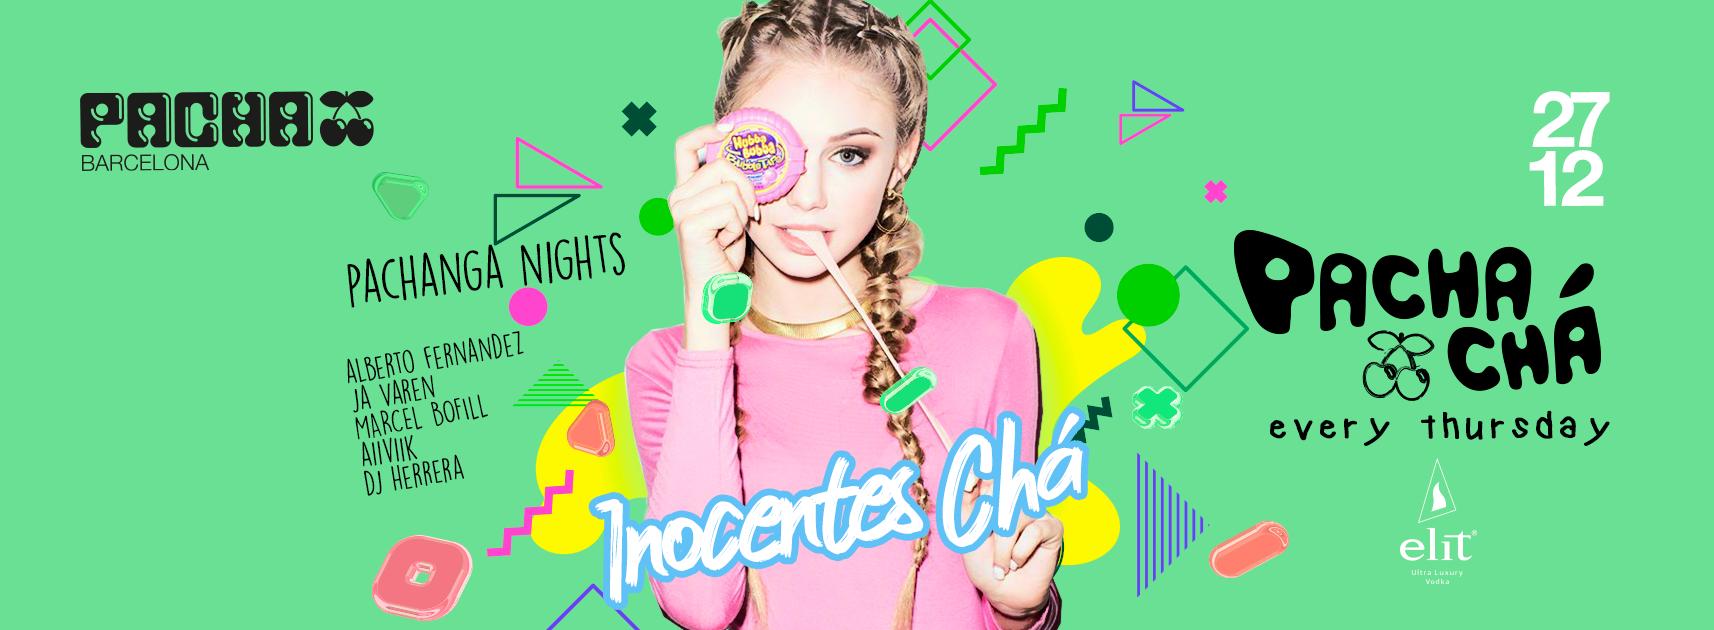 84bb0131a45c Pacha Barcelona Pacha-chÁ - Every Thursday Guestlist, tickets and ...